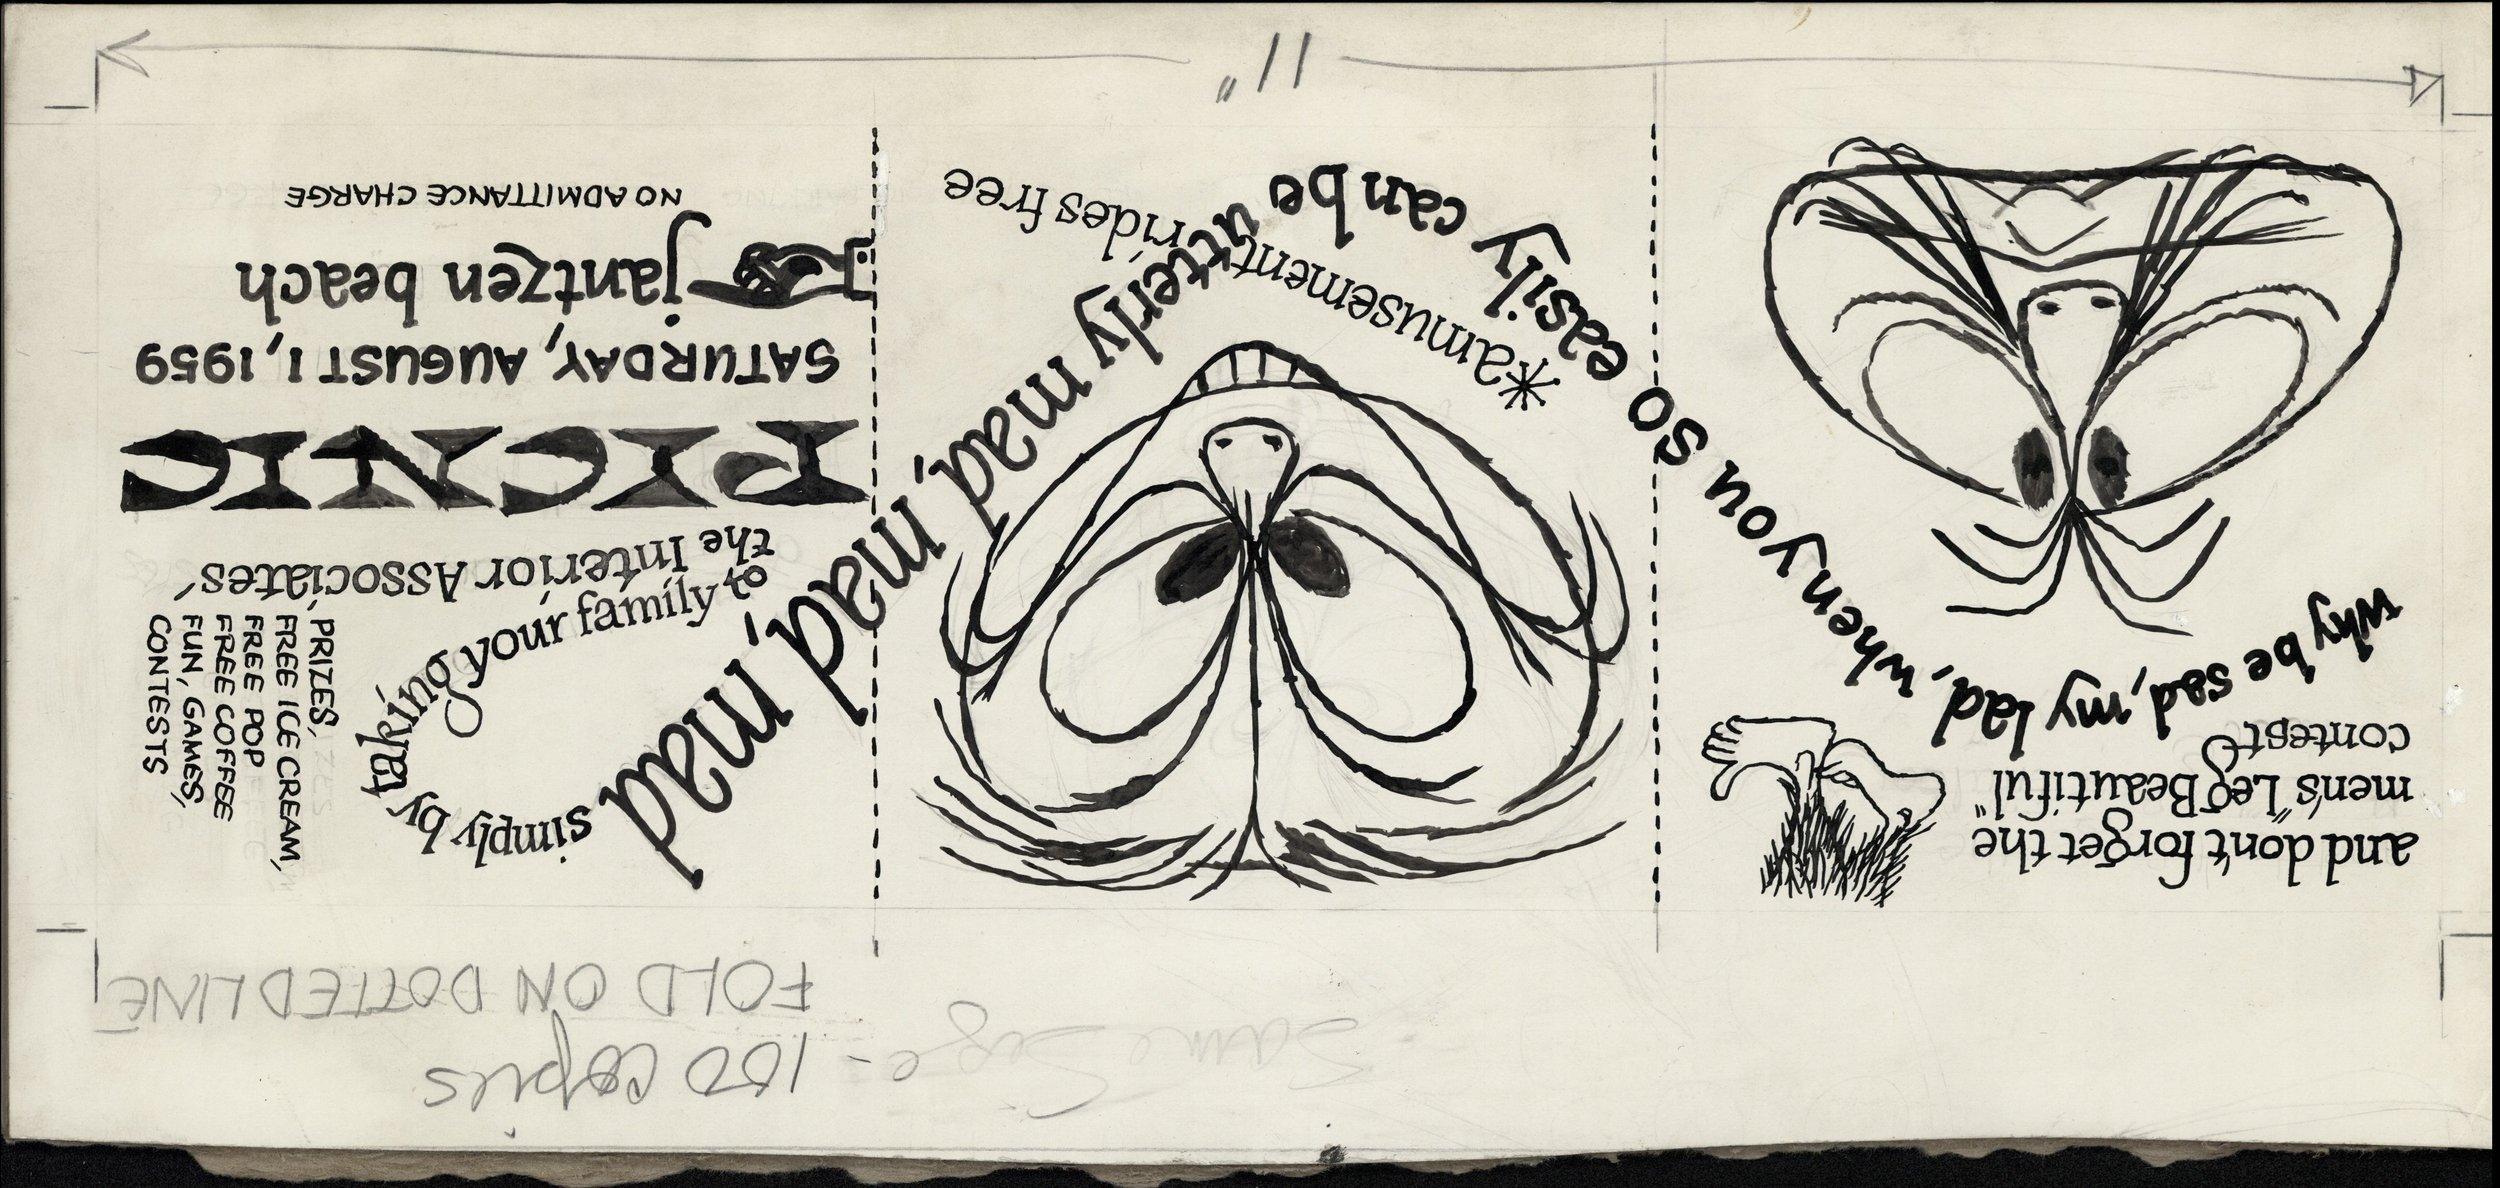 Associates Picnic mad mad_Hoff_table card_1959_Folder 2.jpg